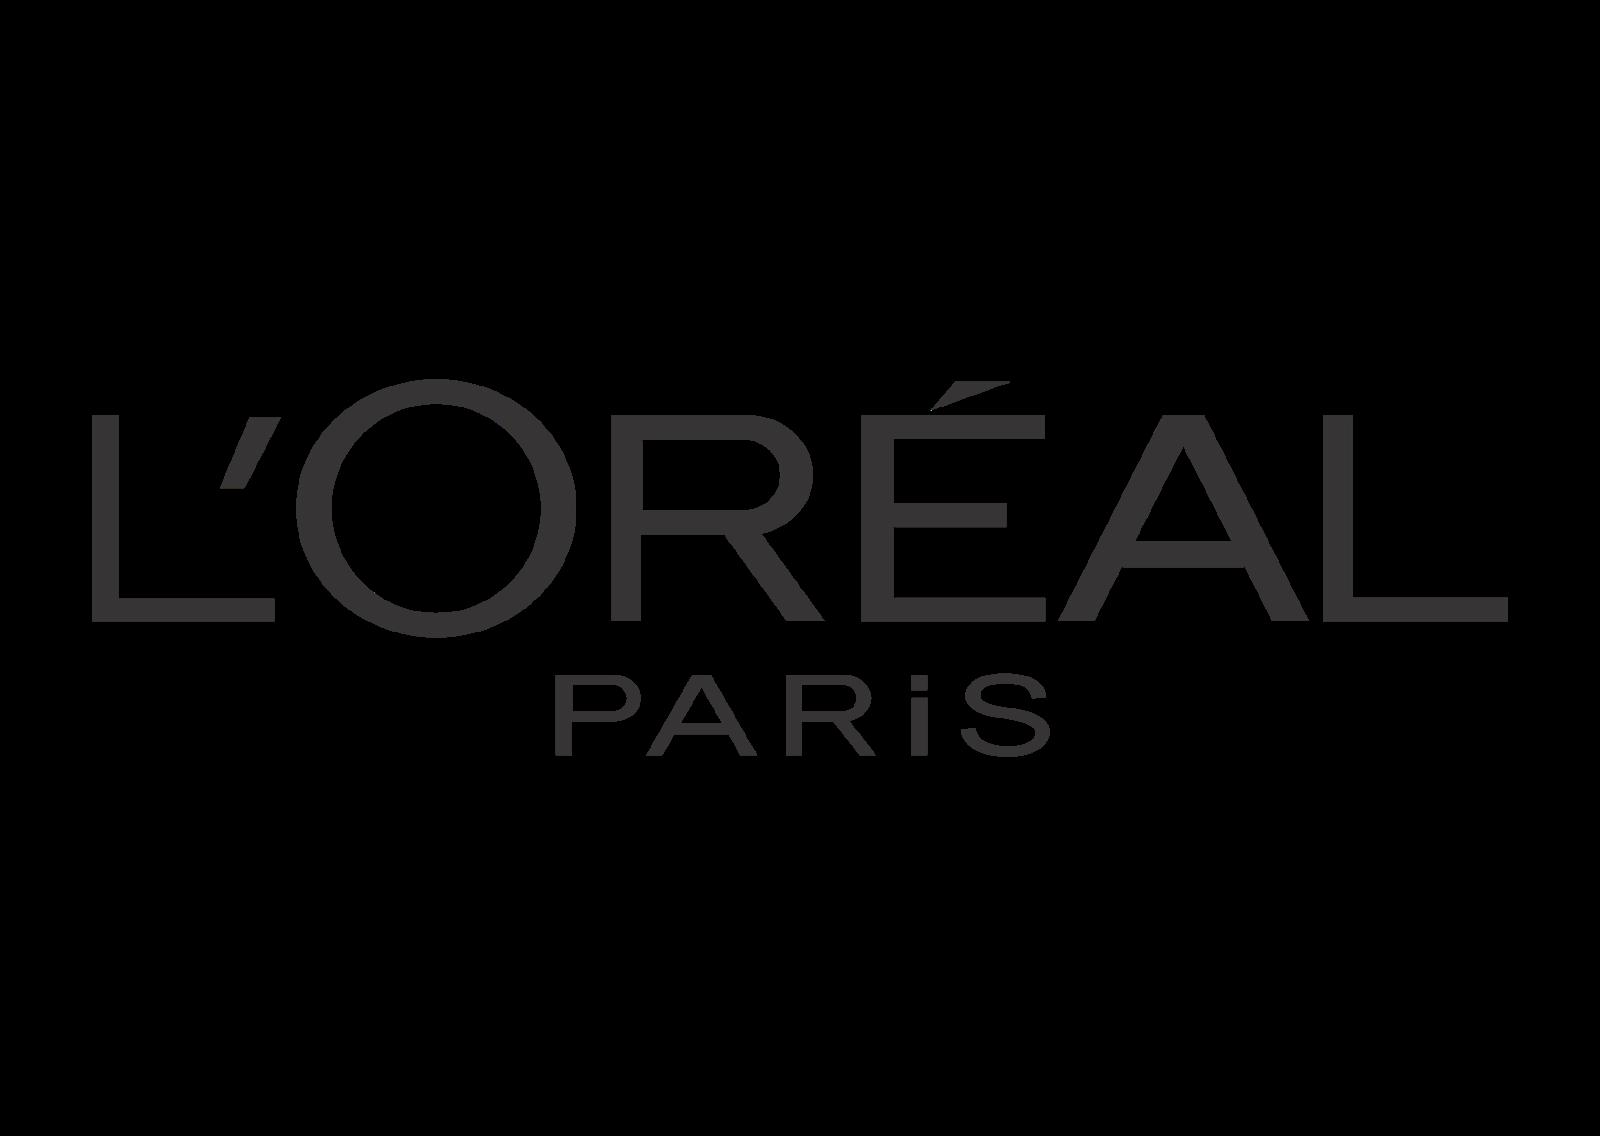 Loreal-paris-logo-vector.png